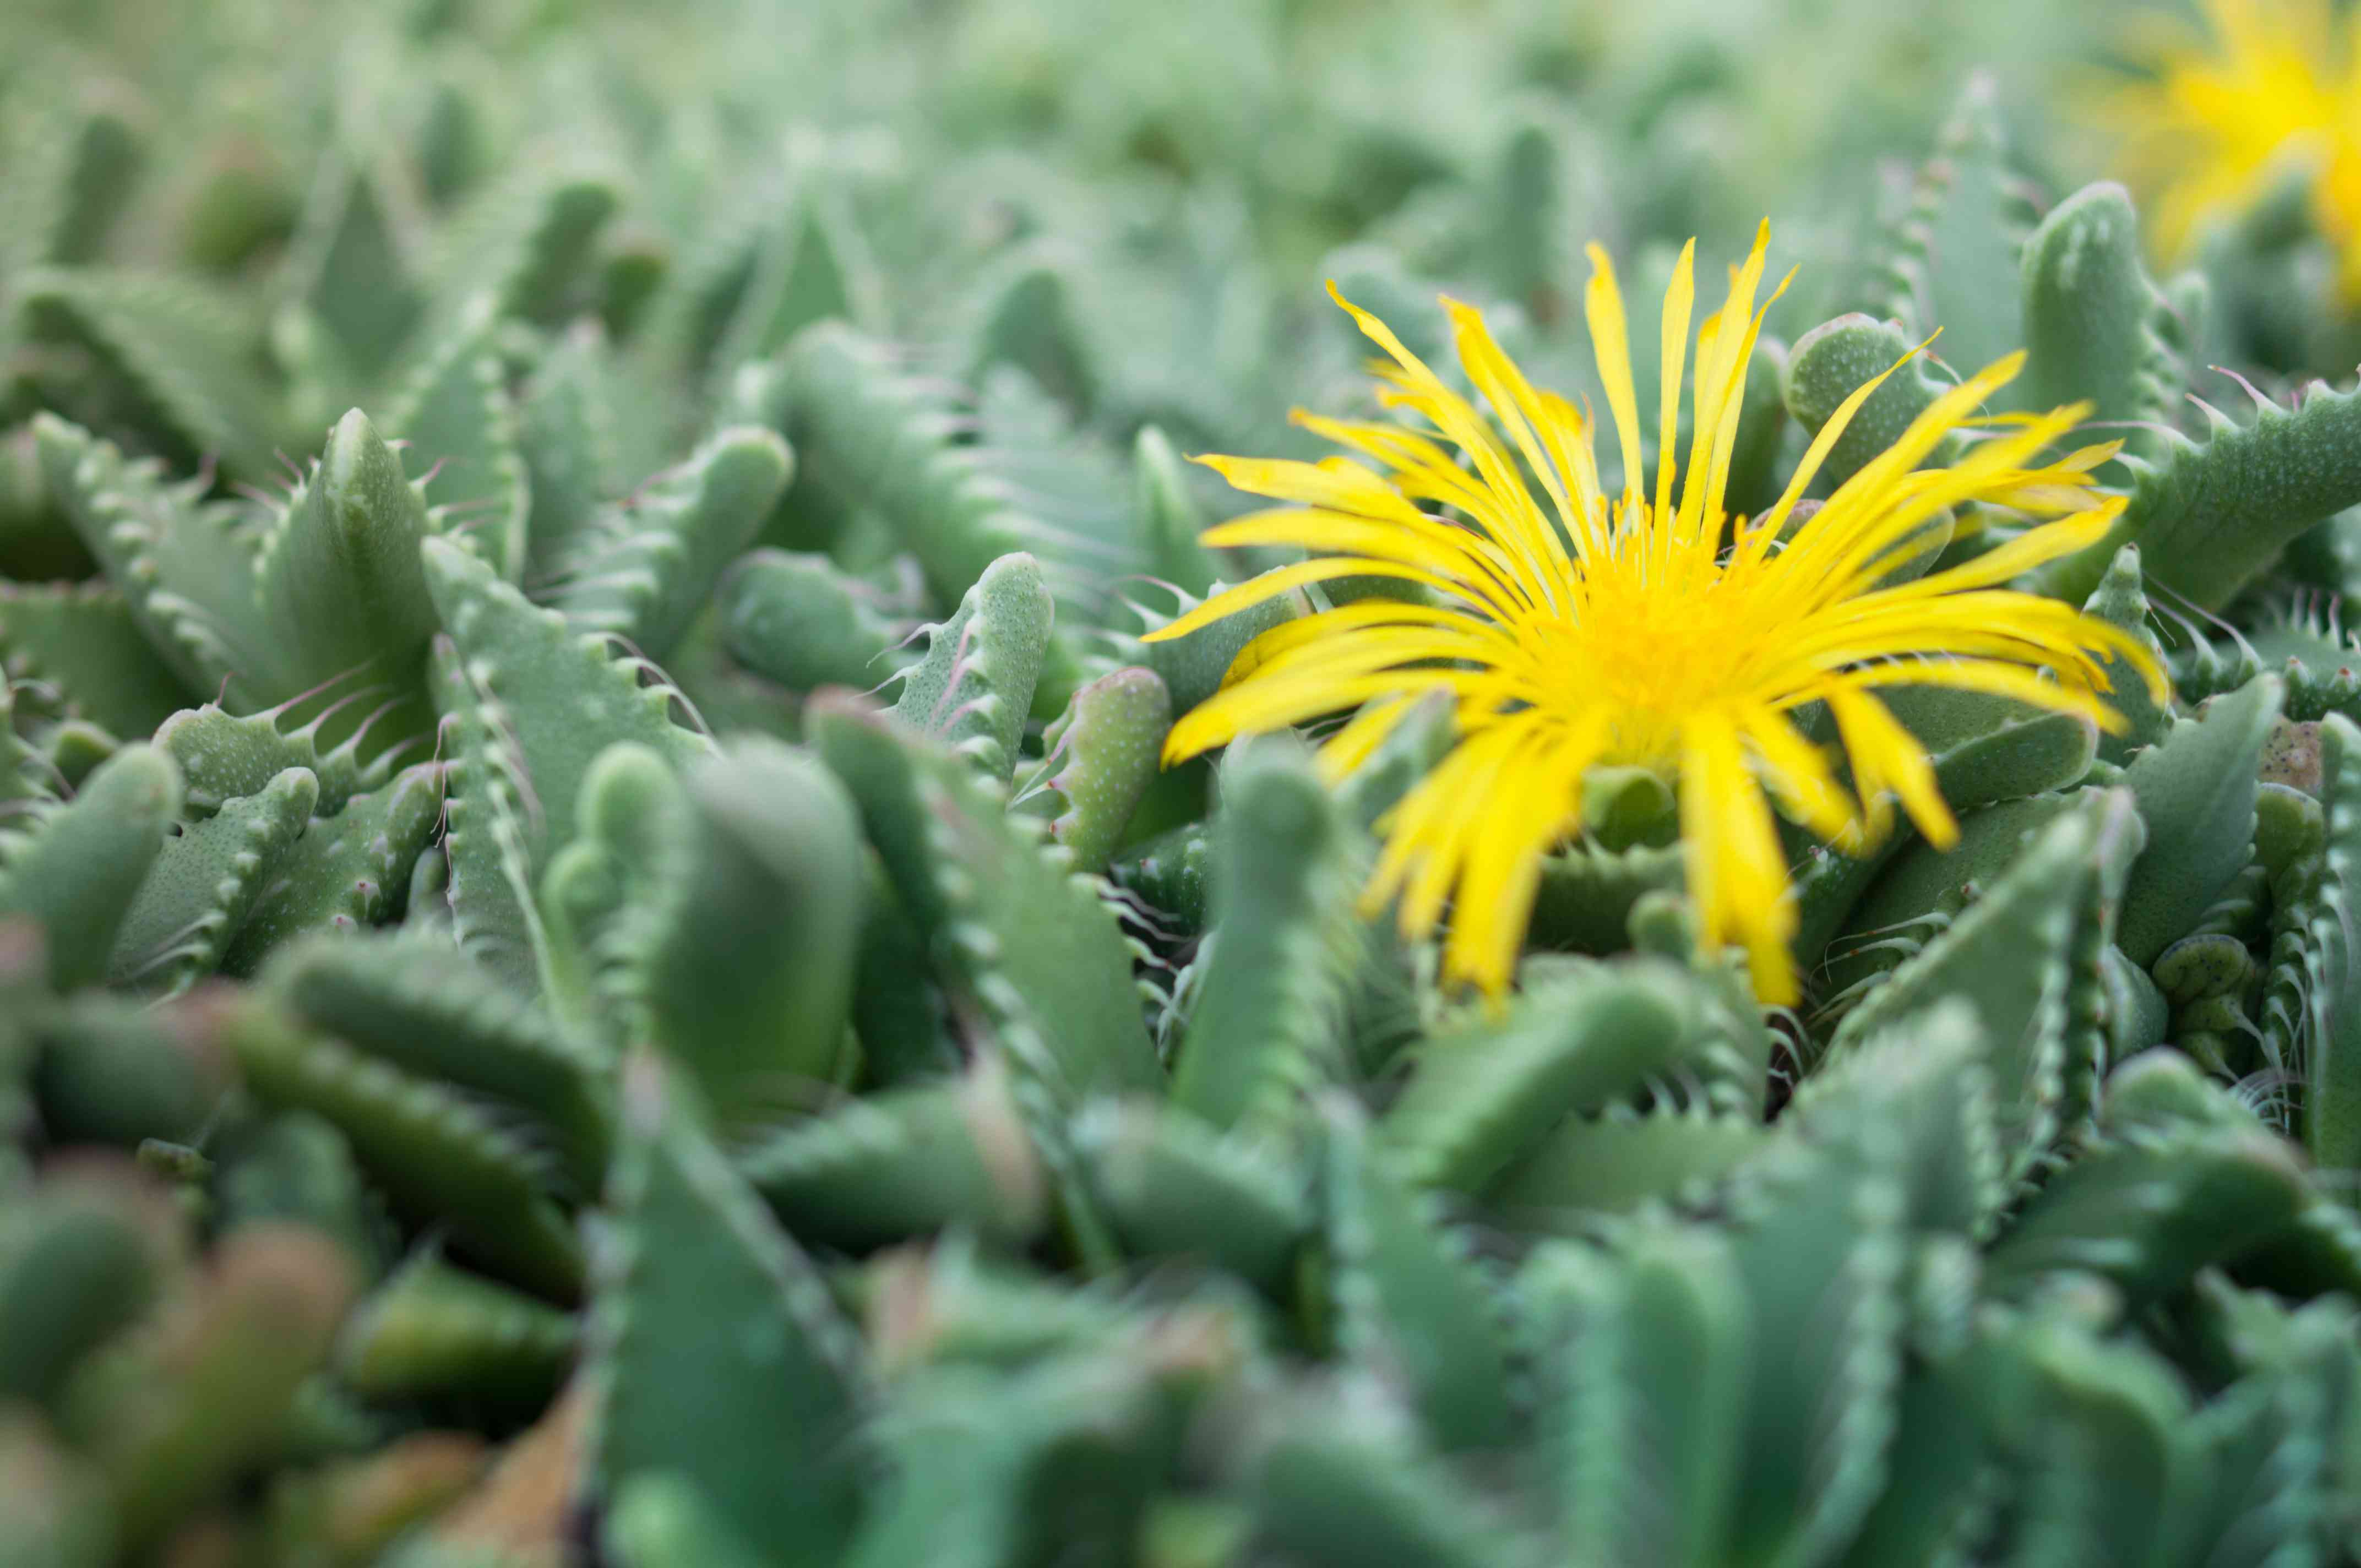 Faucaria tuberculosa - Yellow Flower Pebbled Tiger Jaws Cactus